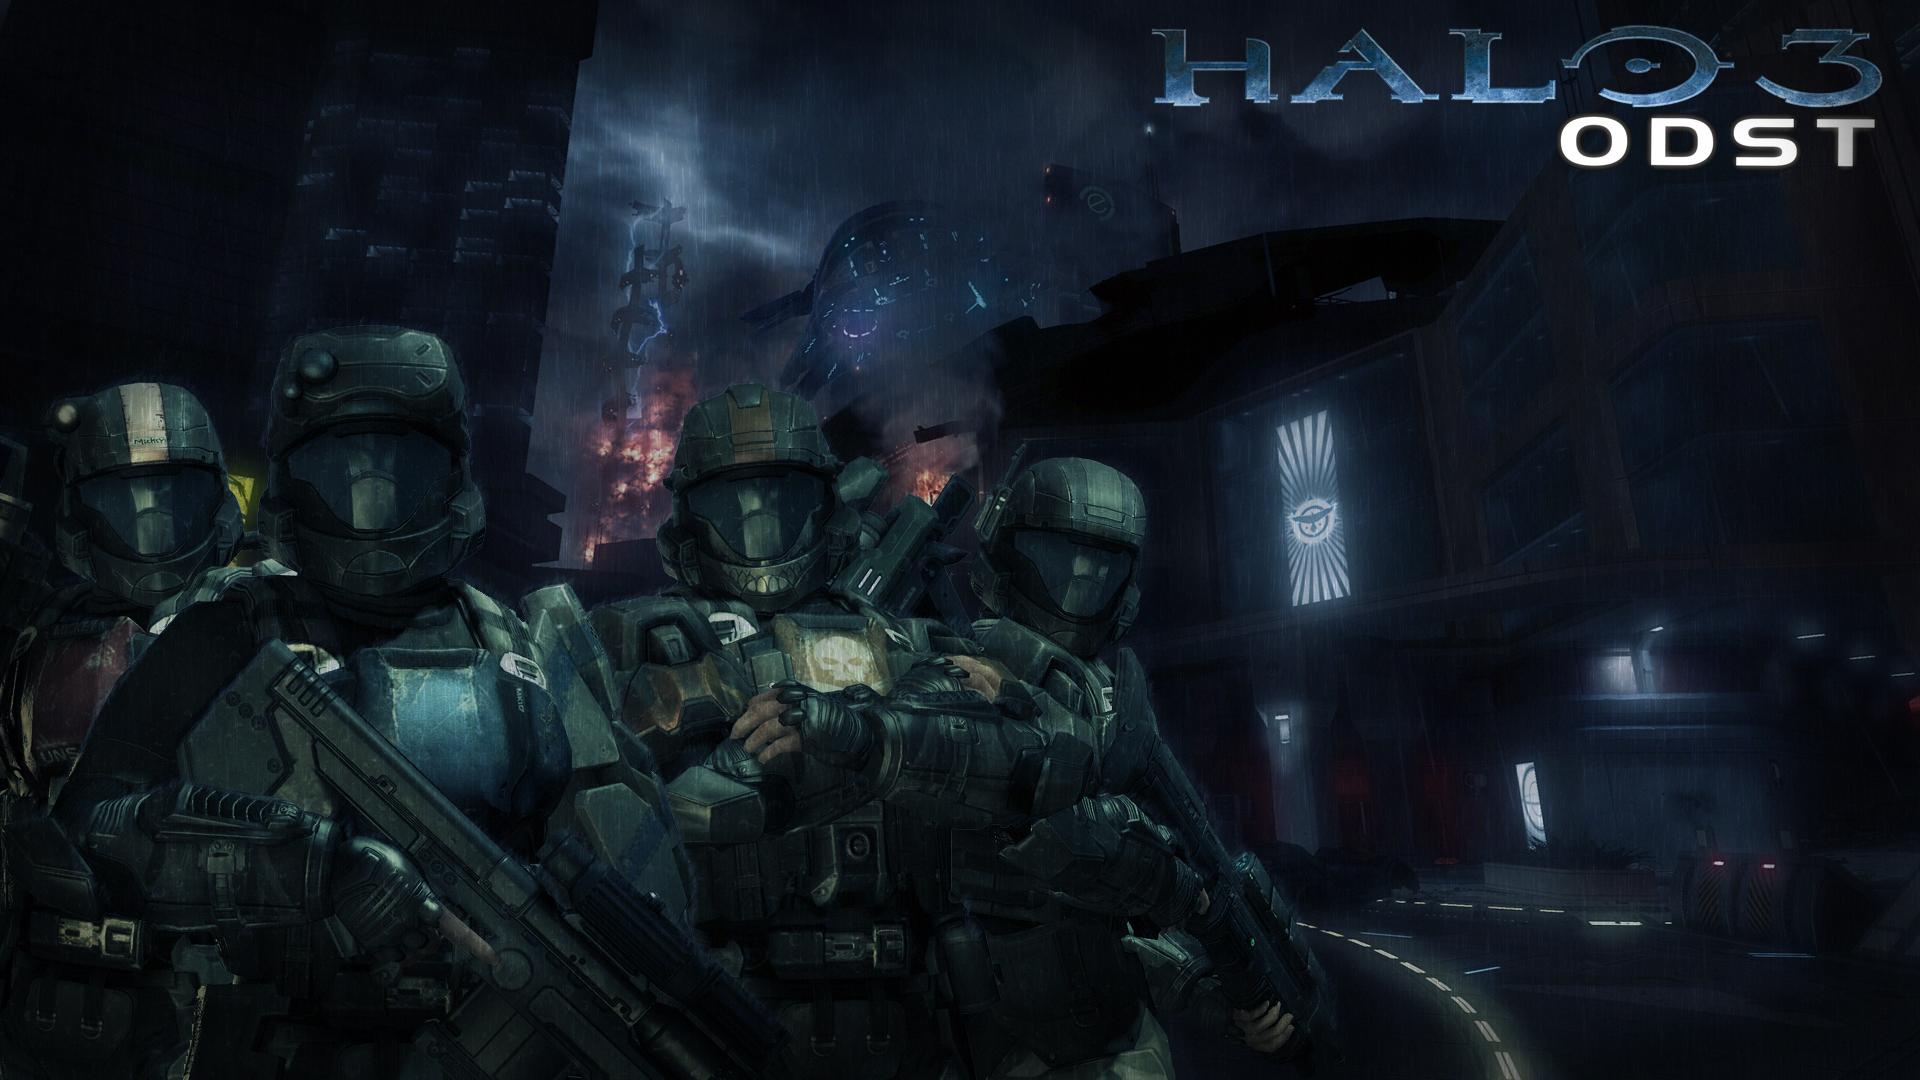 47 Halo 3 Odst Wallpaper On Wallpapersafari